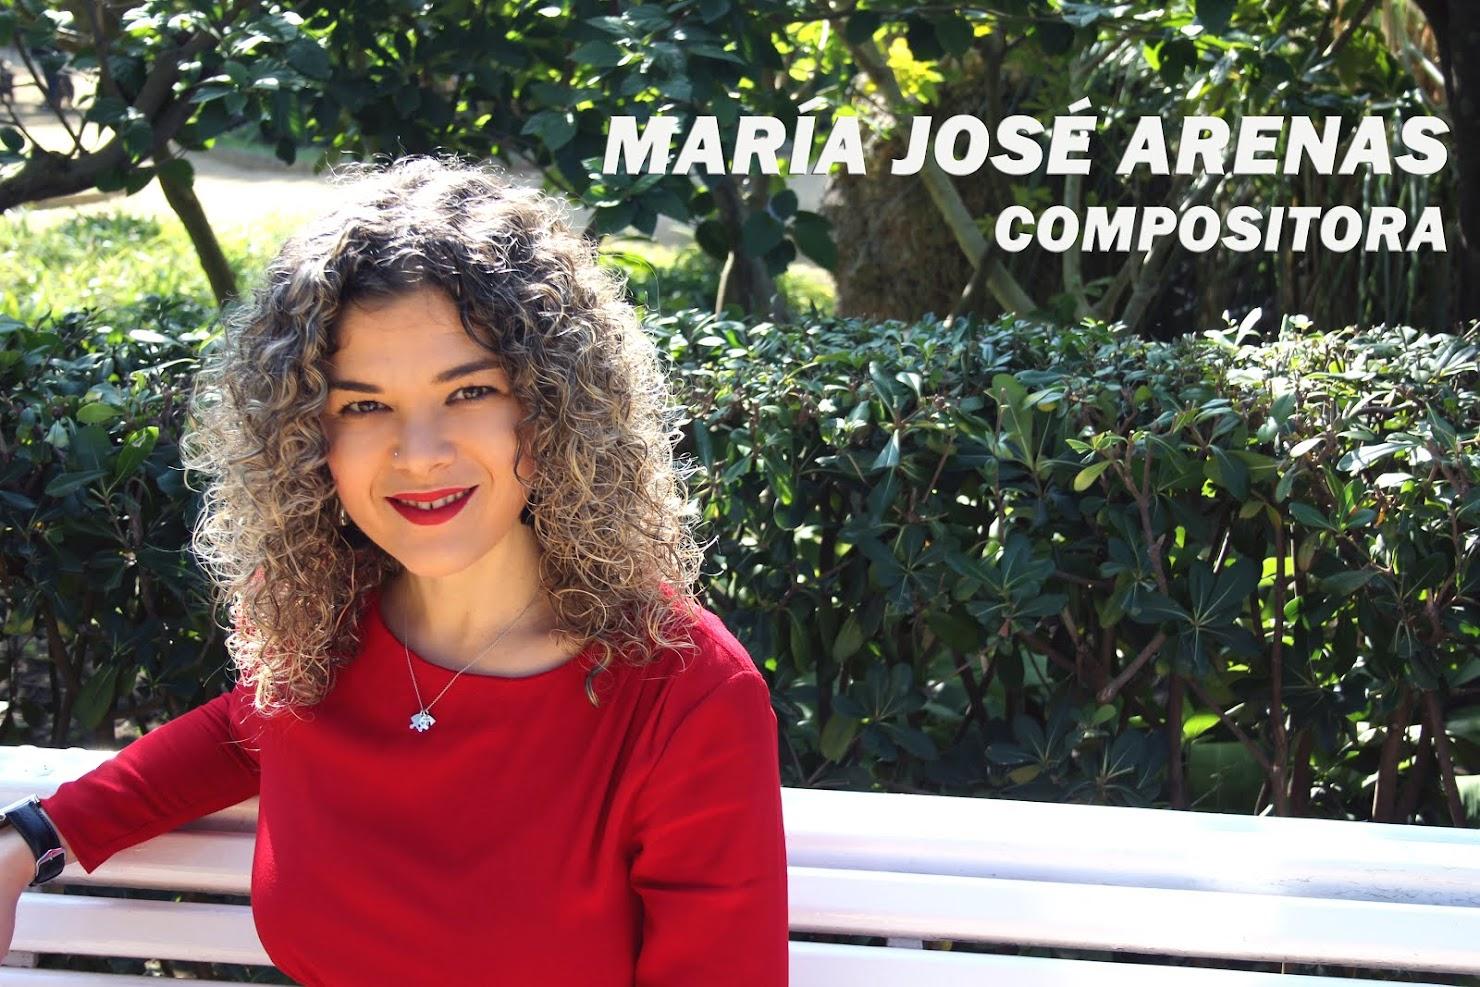 MARIA JOSE ARENAS